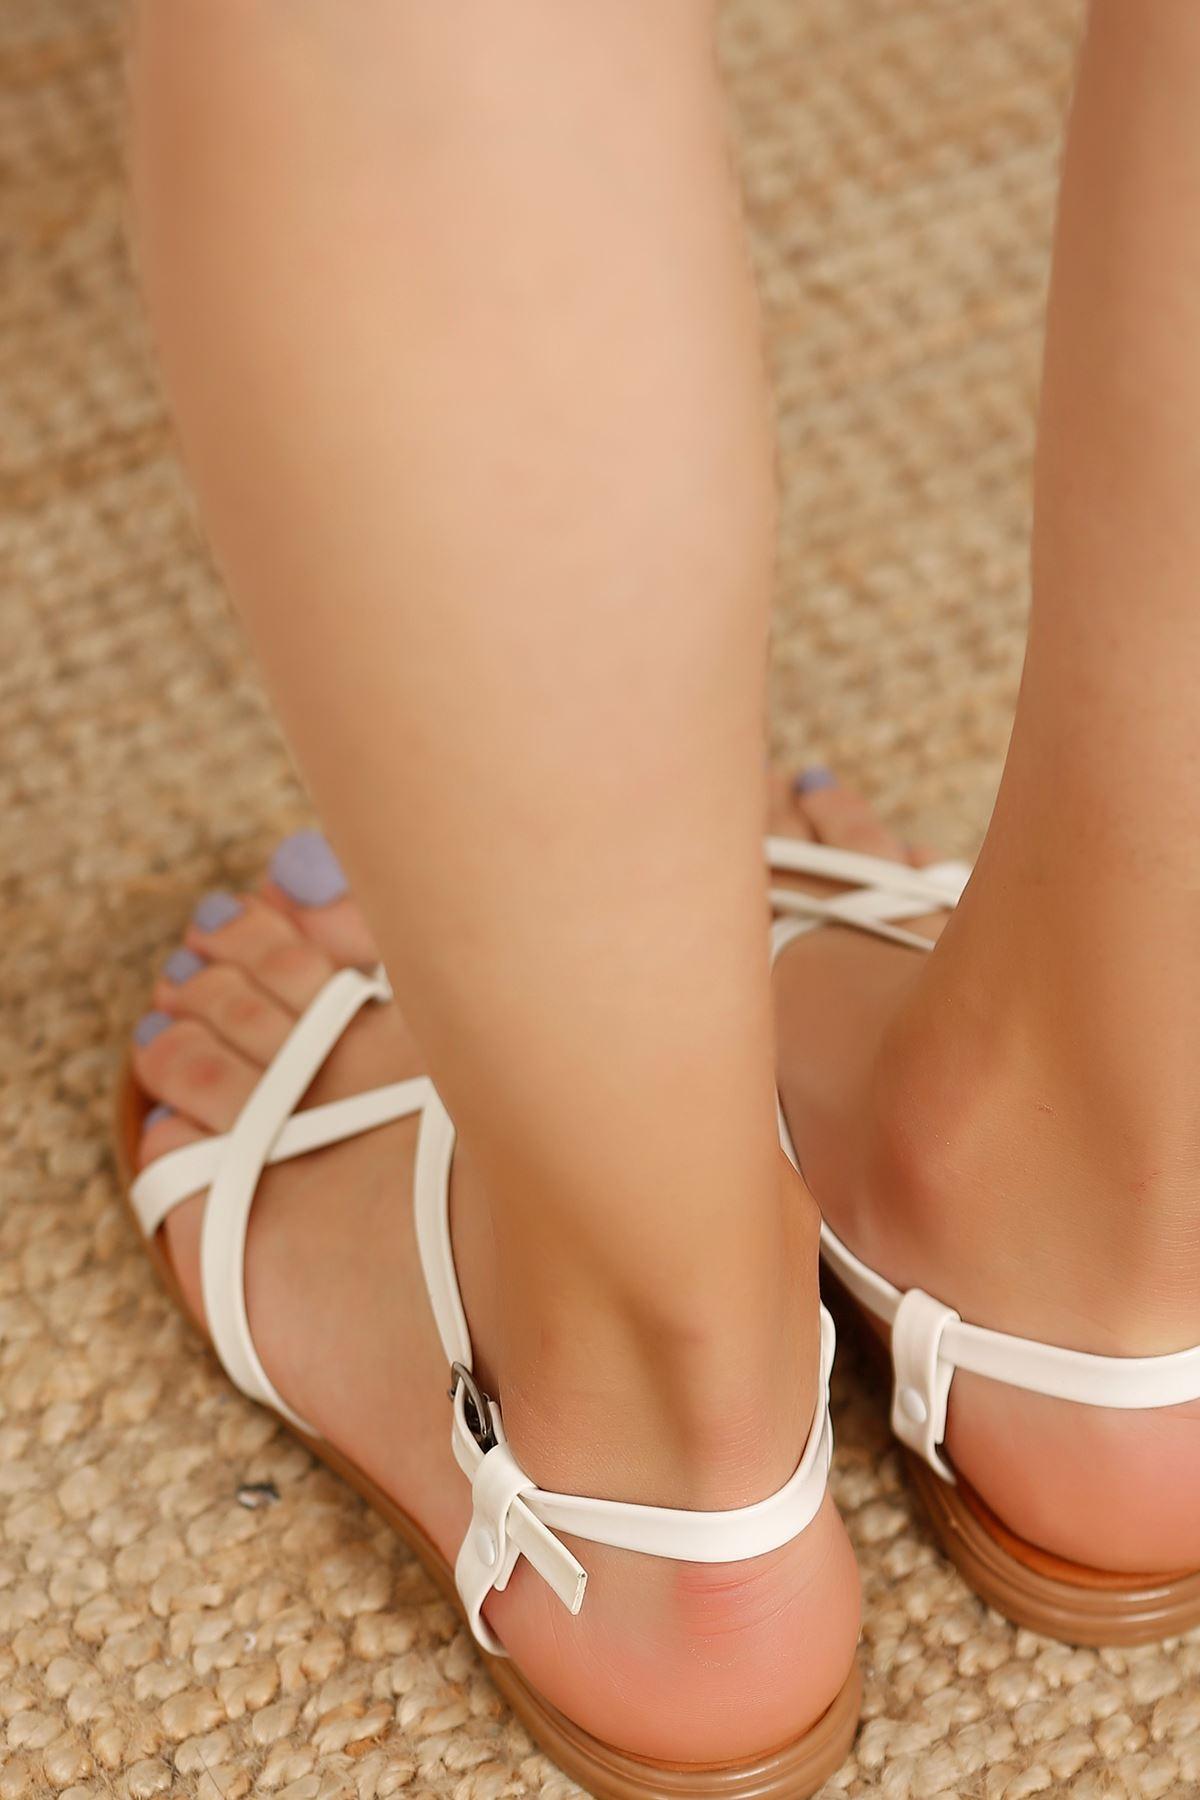 Parmak Arası Çapraz Sandalet Beyaz - 4162.264. - y.s